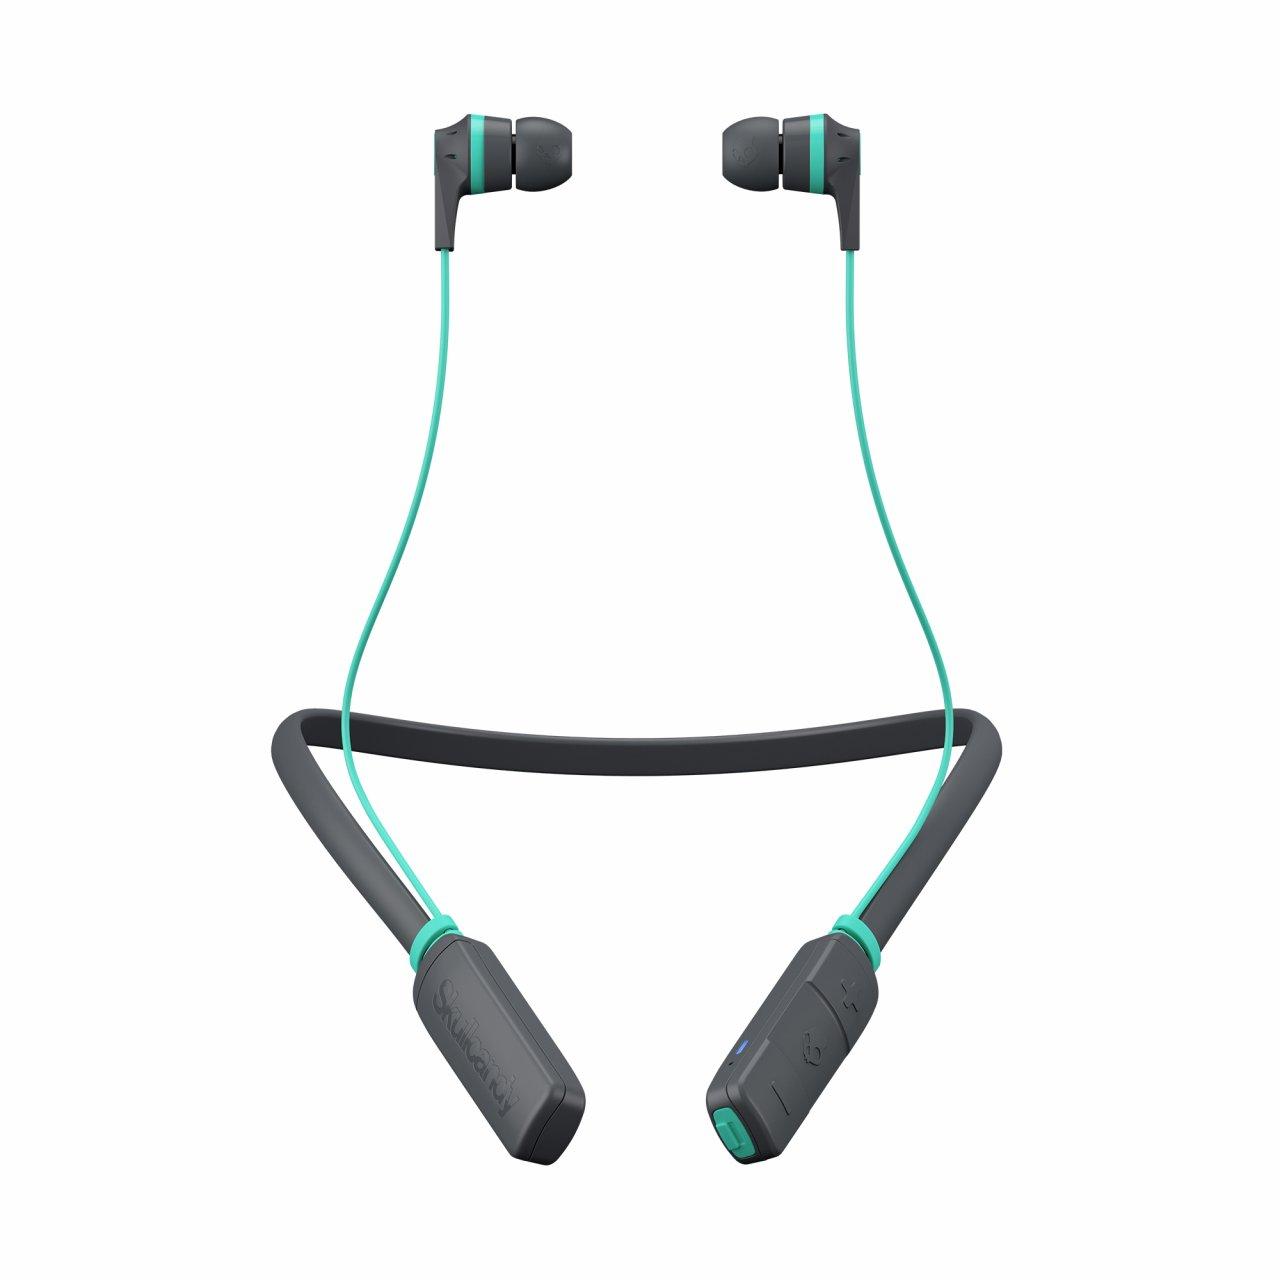 hight resolution of shop ink d wireless earphones free delivery skullcandy bluetooth speaker wiring diagram earphones wiring diagram skullcandy